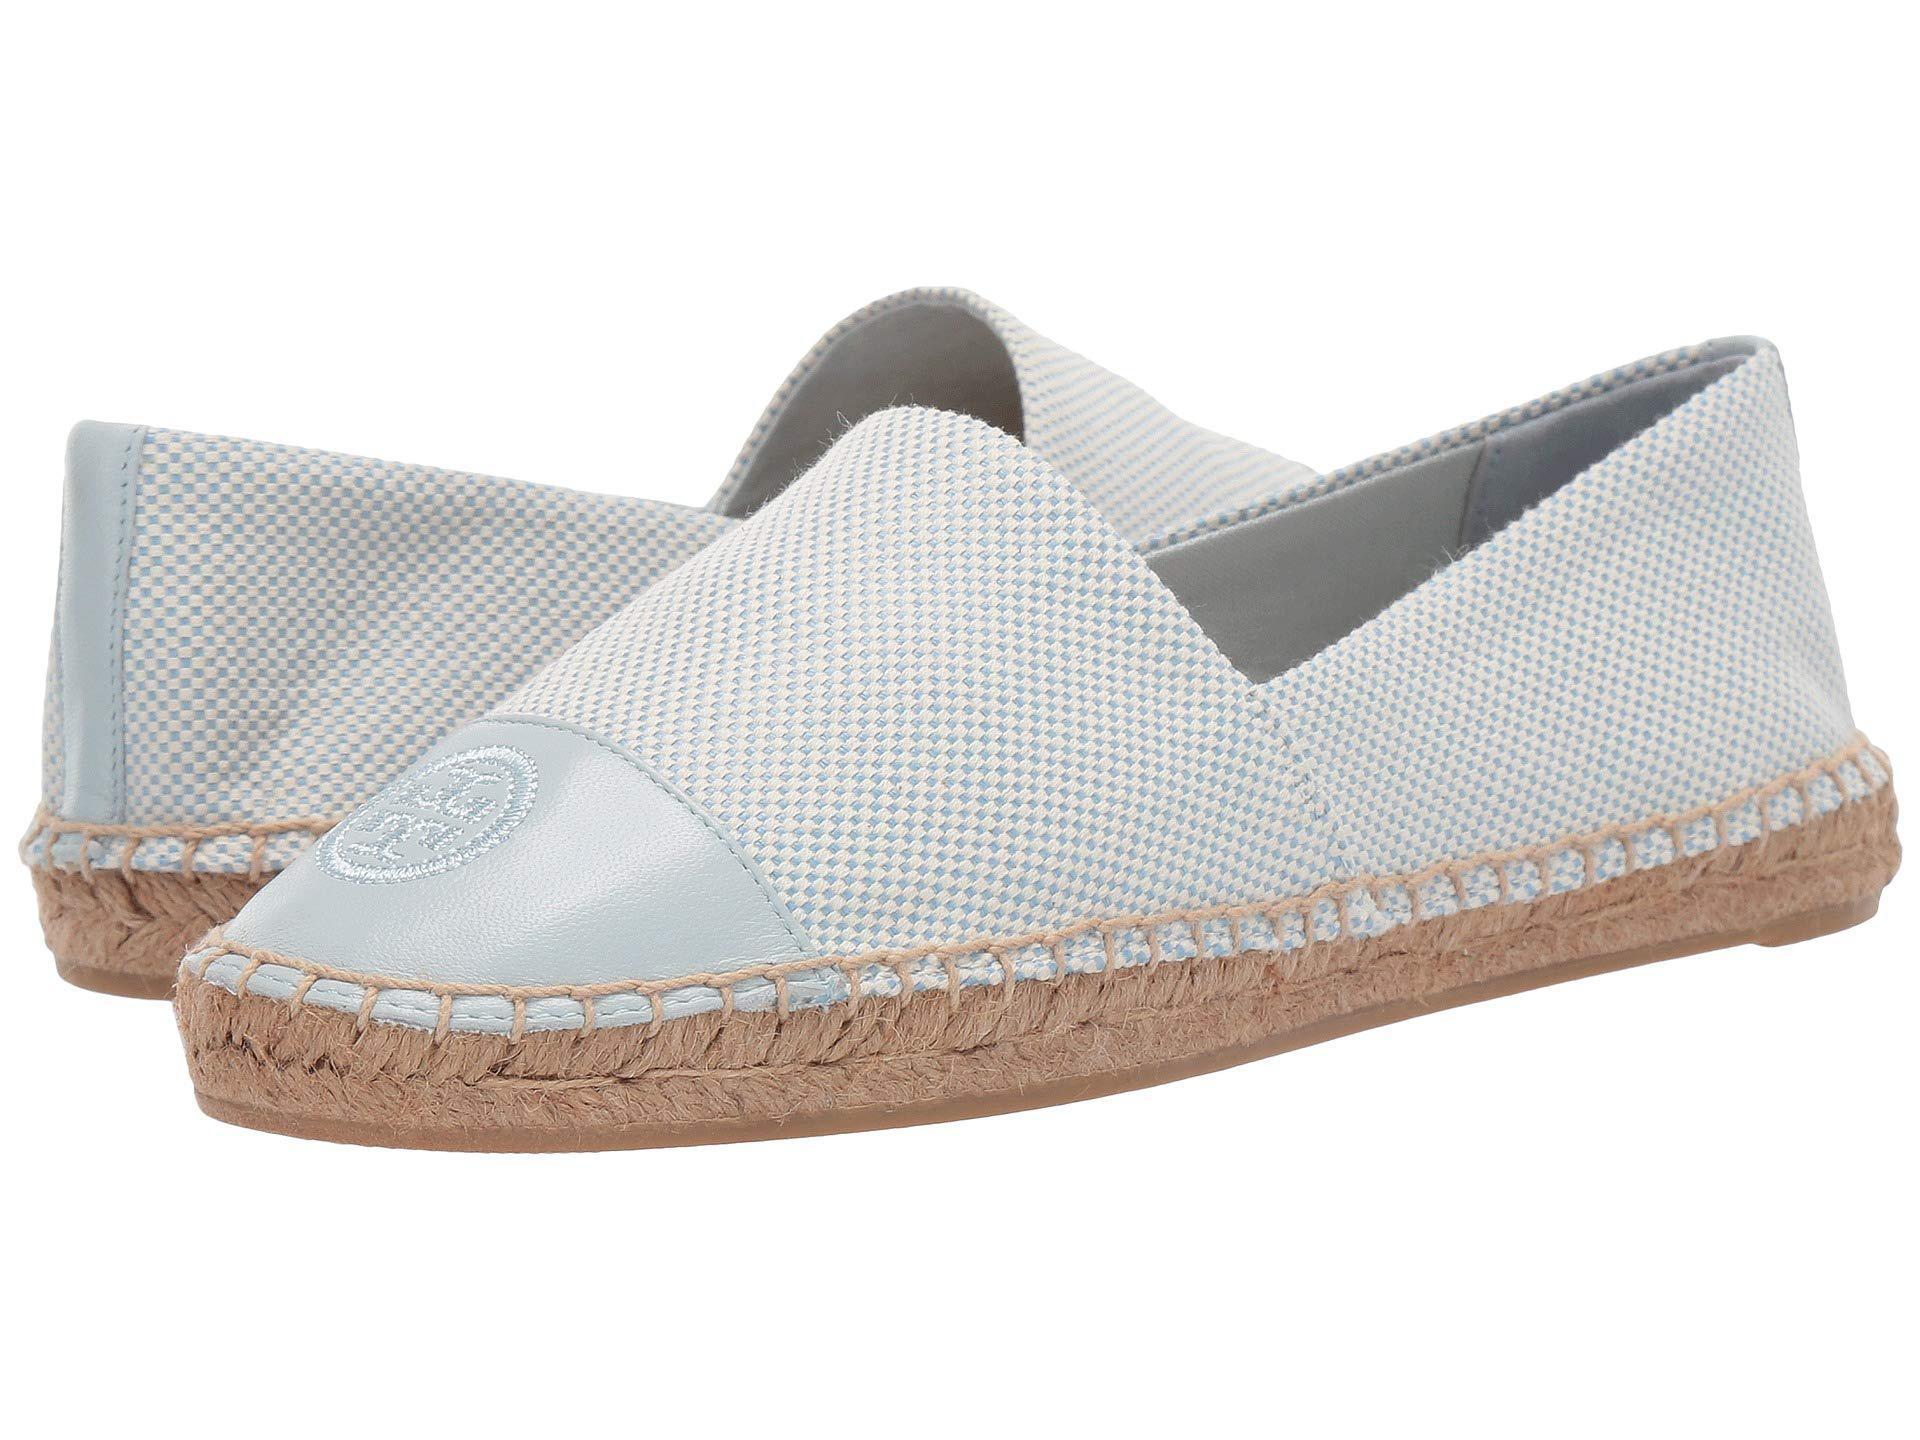 014c9bb7bf2c1d Tory Burch - White Color Block Flat Espadrille (denim Chambray) Women s  Shoes - Lyst. View fullscreen